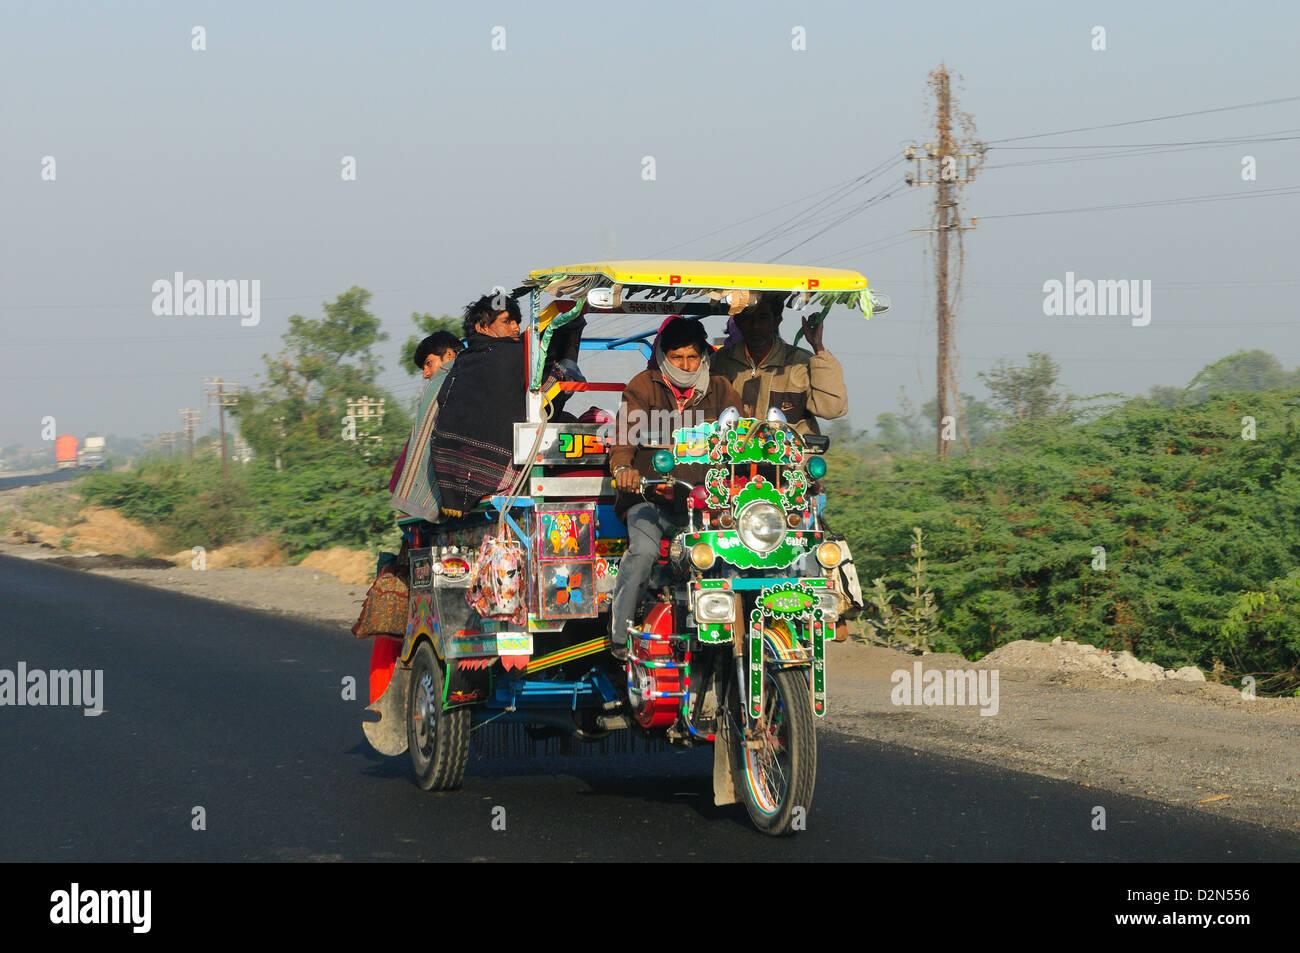 Road Transport India Stock Photos & Road Transport India Stock